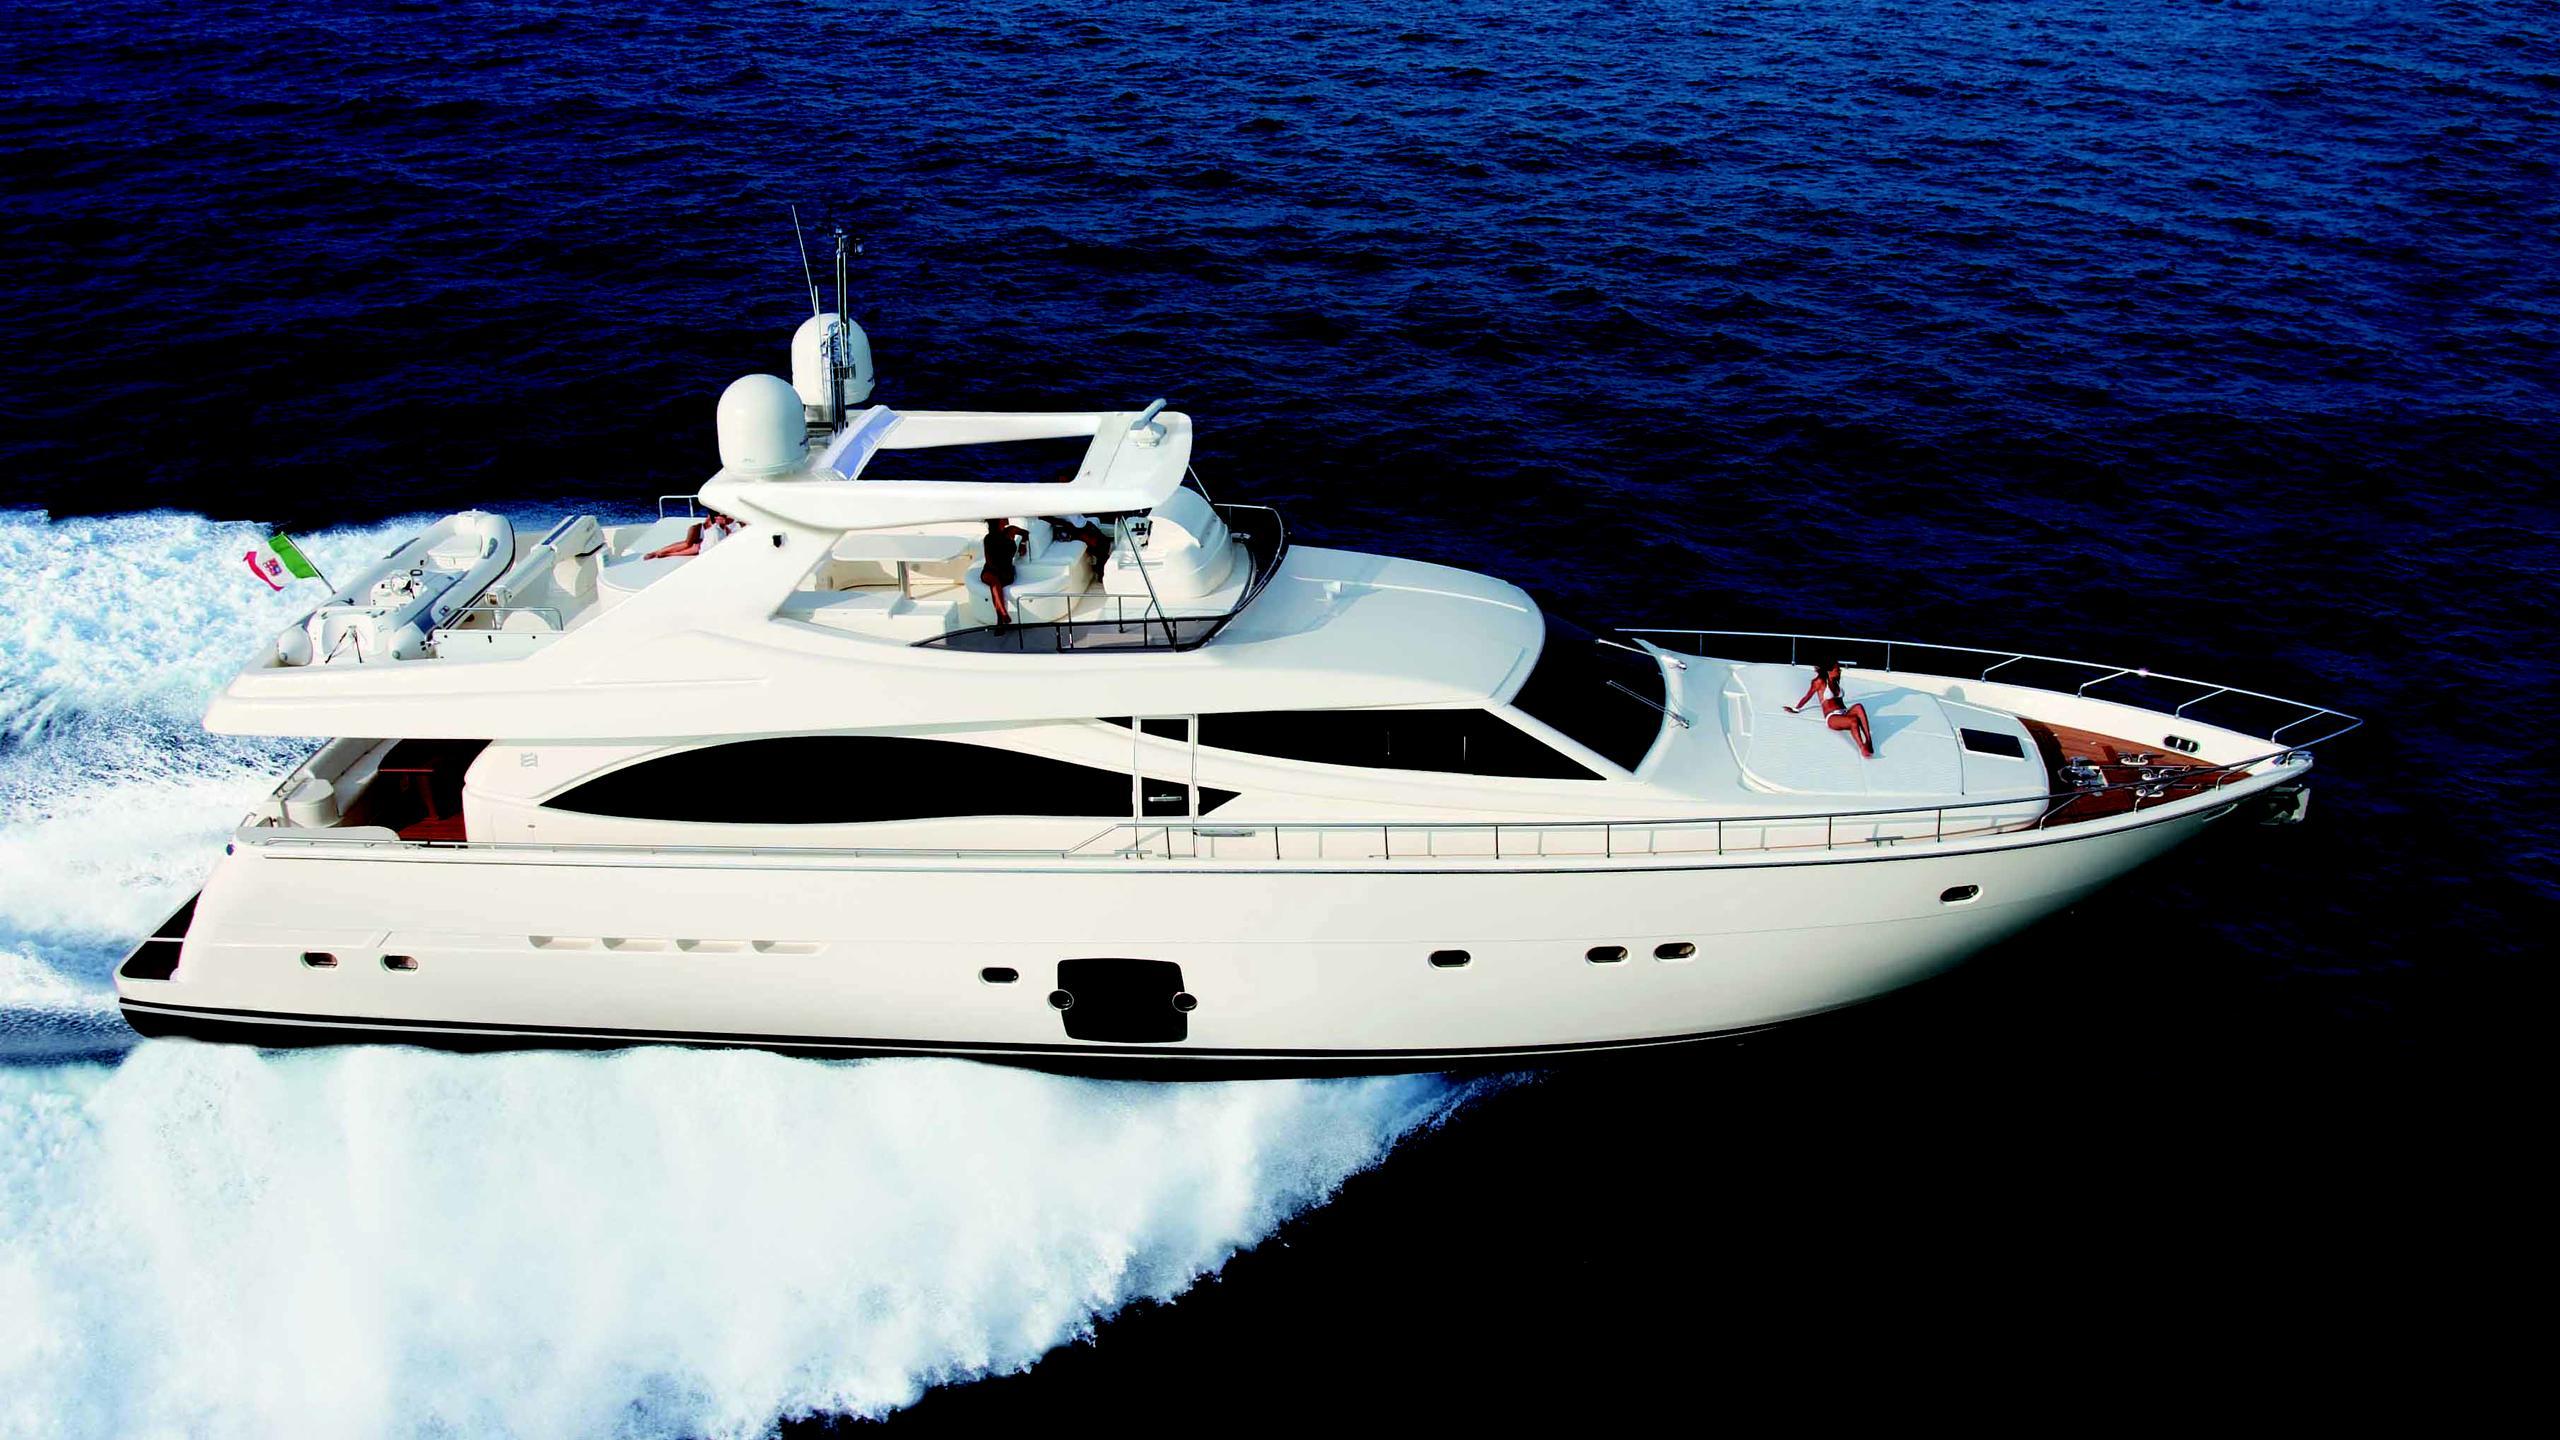 ferretti-830-13-motor-yacht-2005-25m-cruising